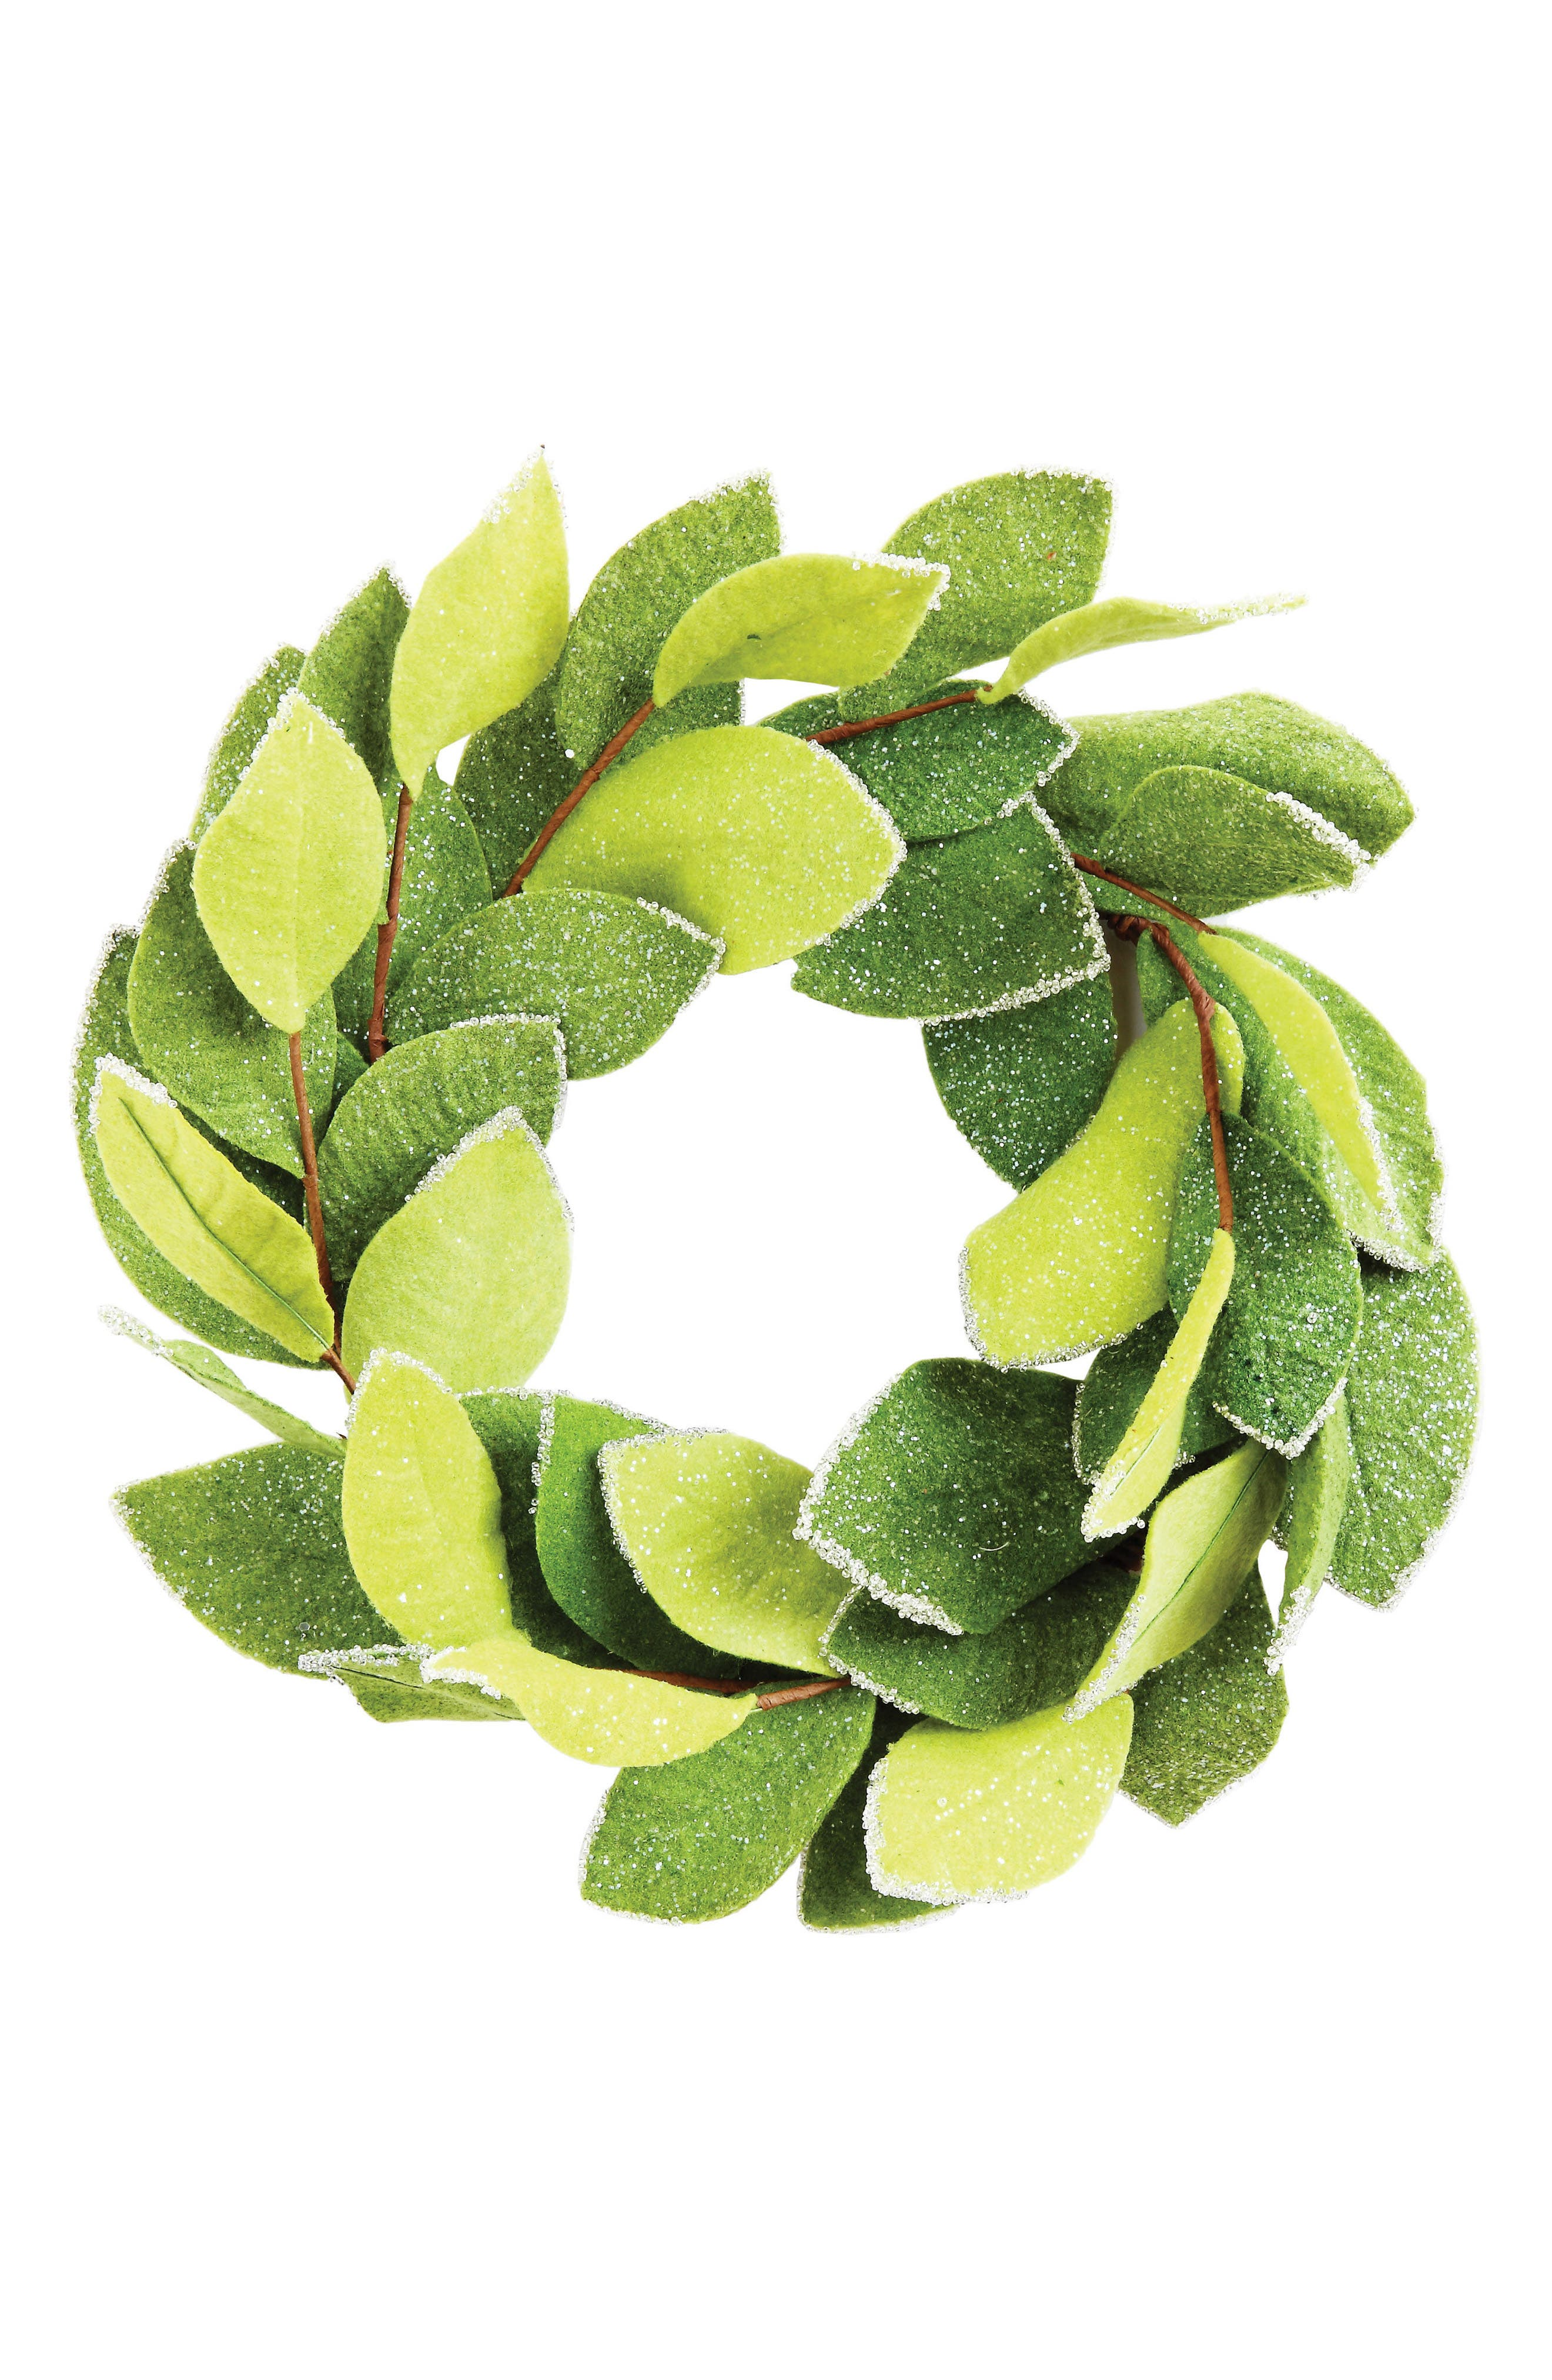 Main Image - Creative Co-Op Felt Wreath